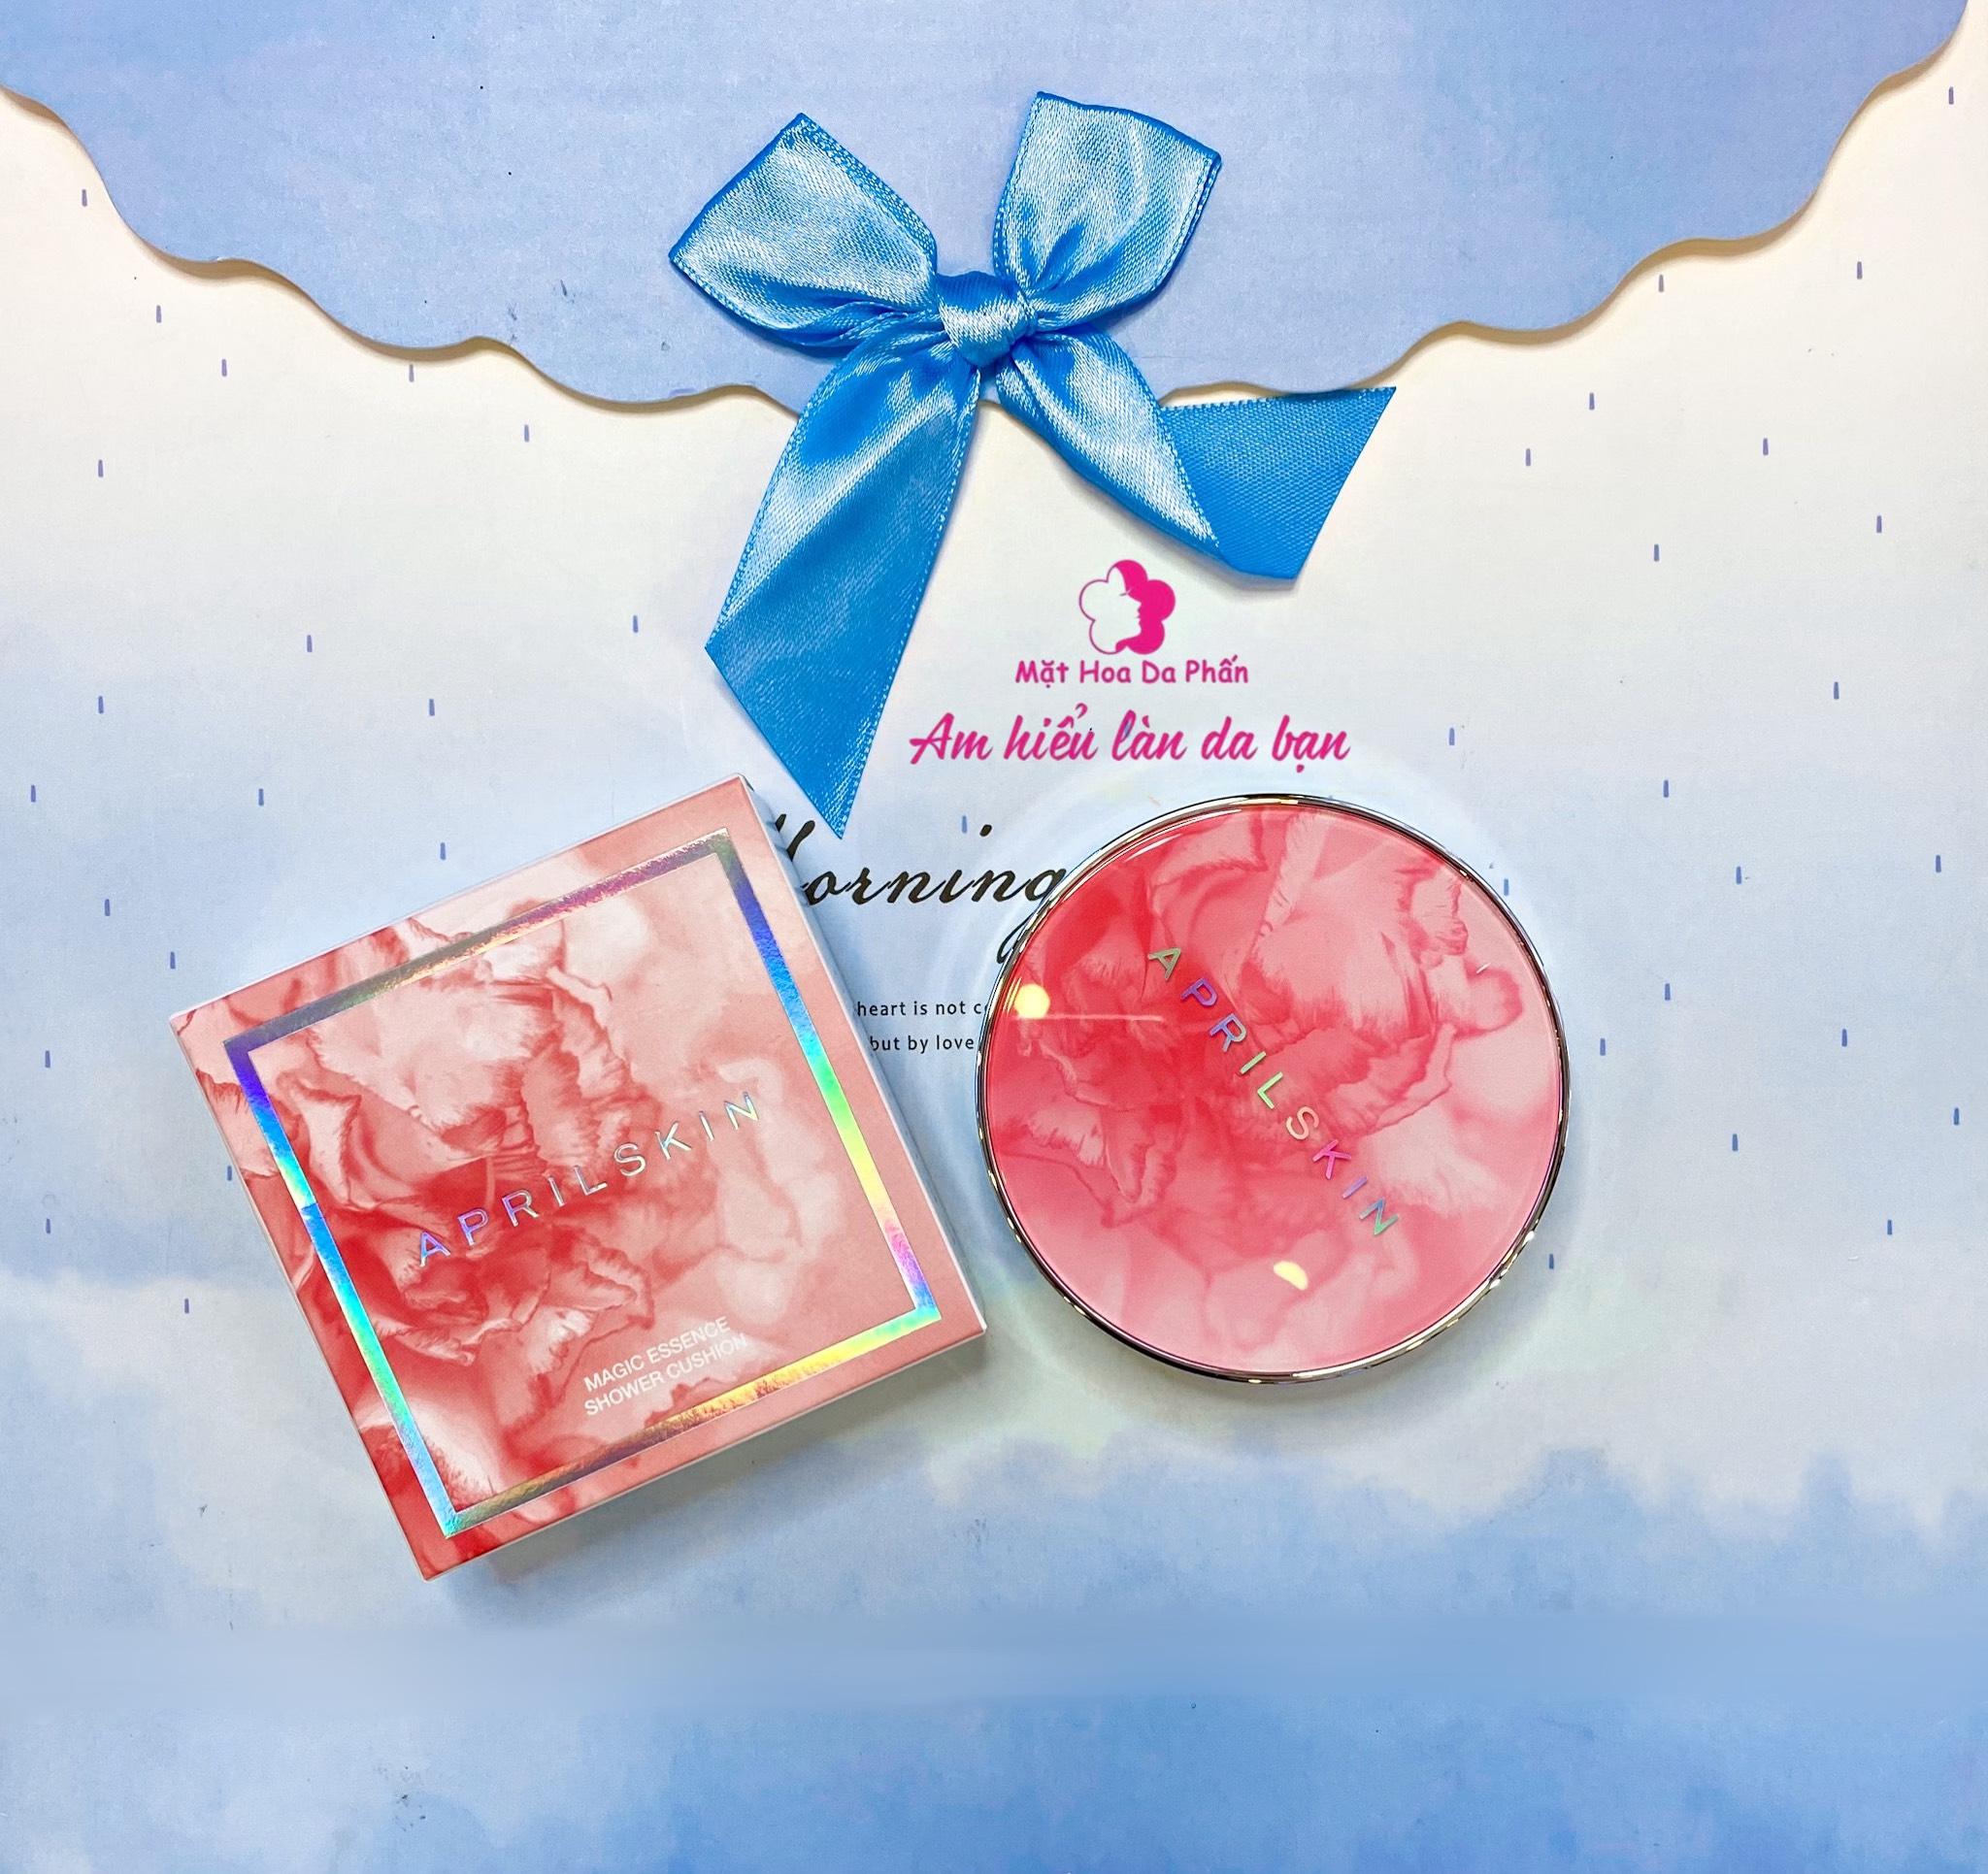 Cushion April SKin Magic Essence Shower #23 (Hồng Marble)